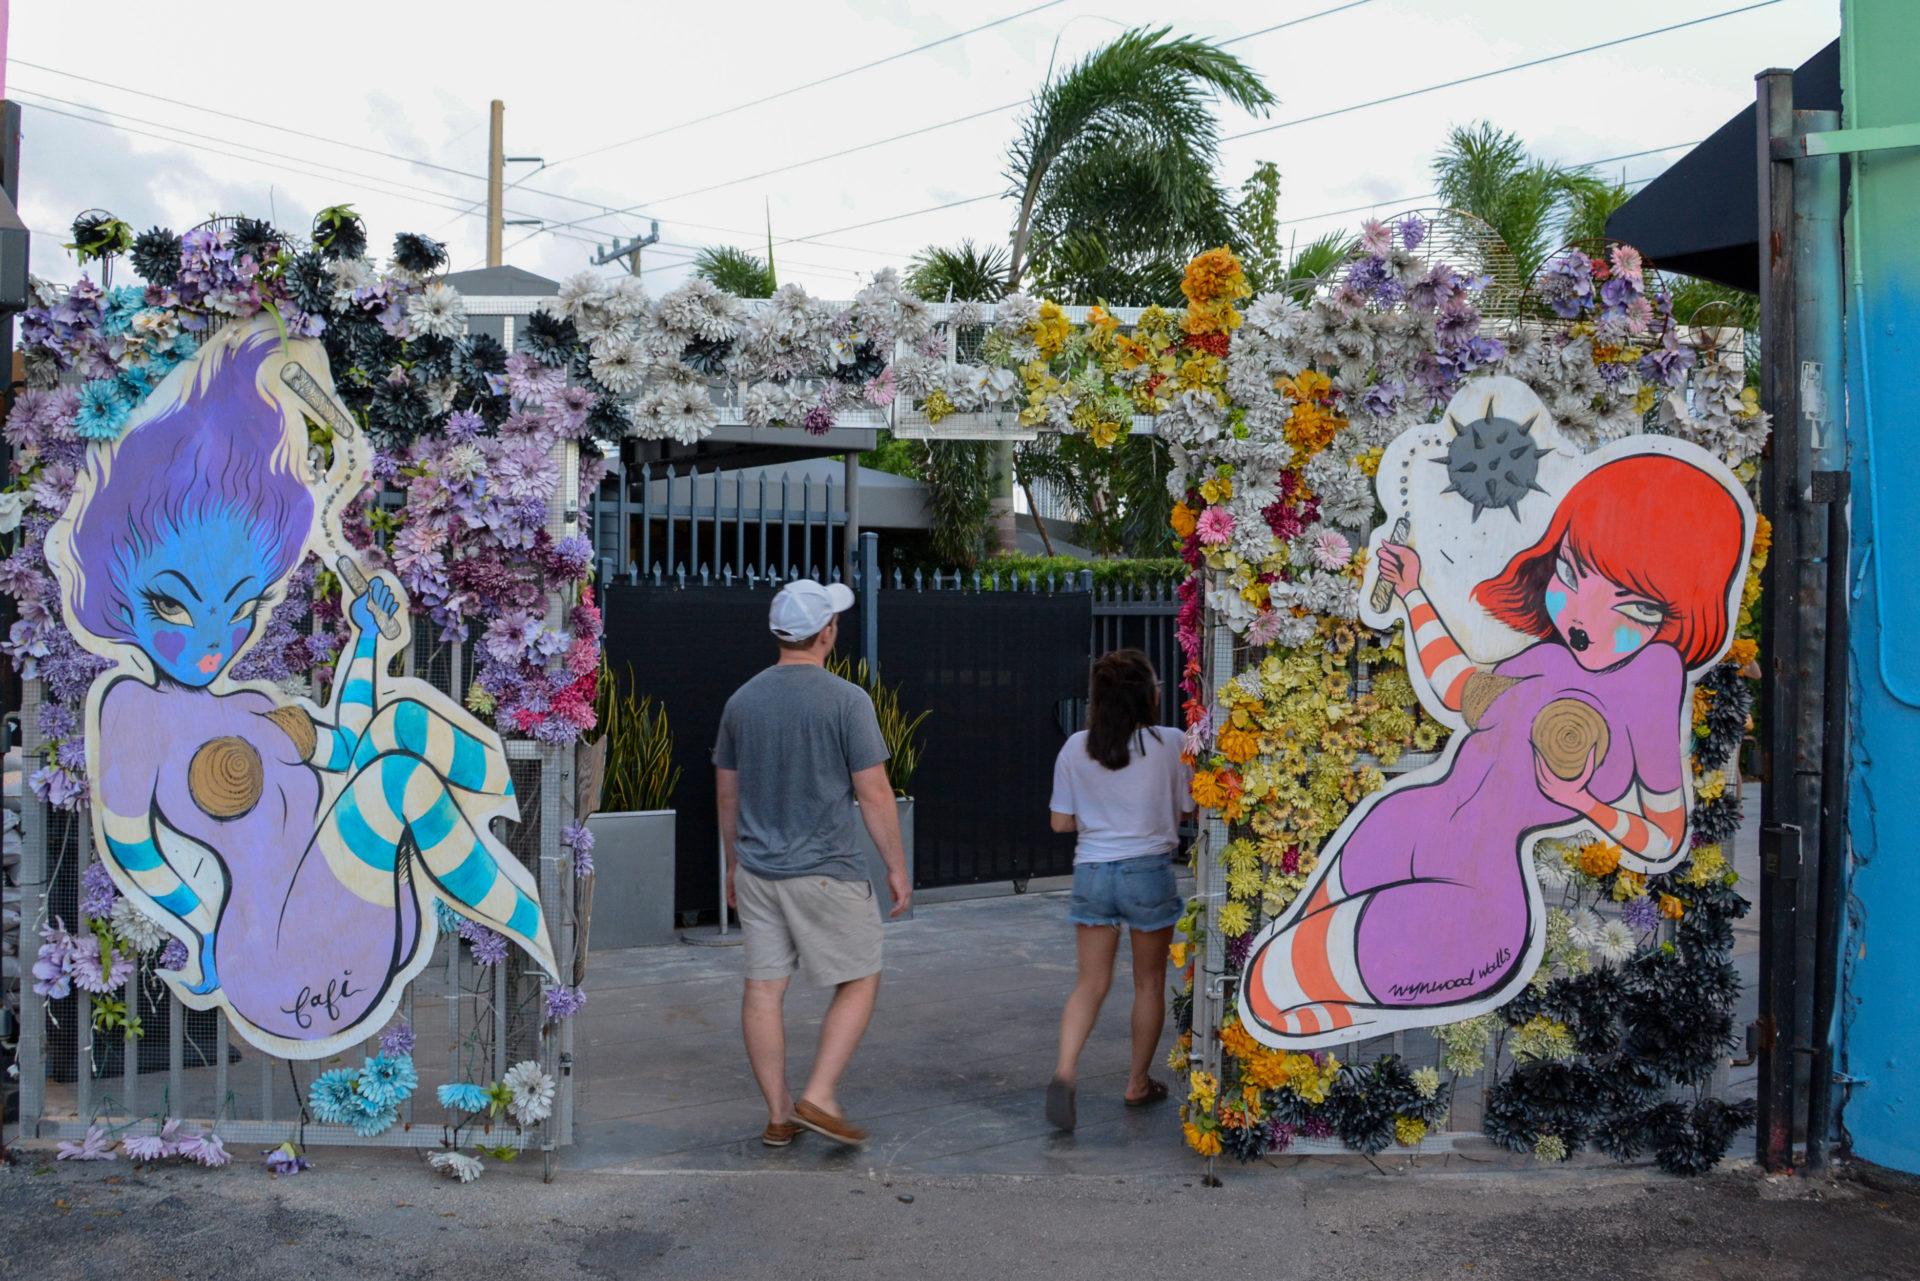 Eingang zu den Wynwood Walls in Wynwood, Miamis hipper Stadtteil